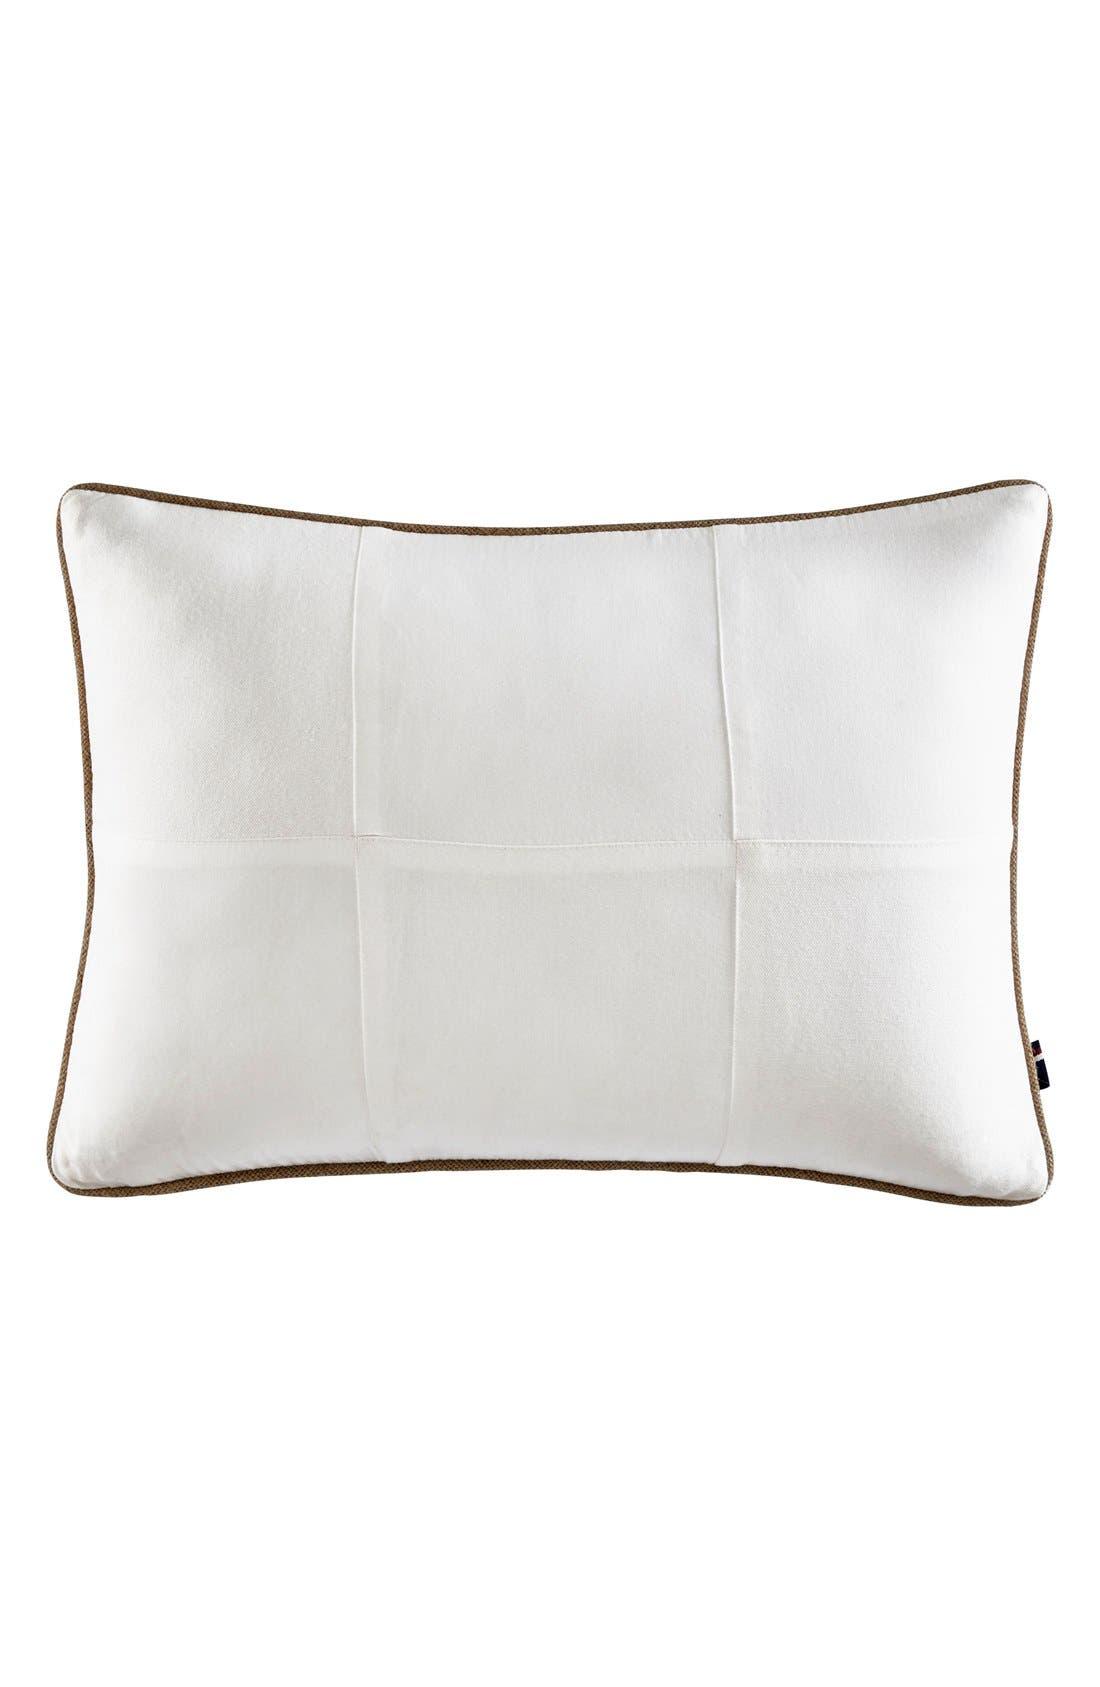 Tommy Hilfiger Longview Accent Pillow